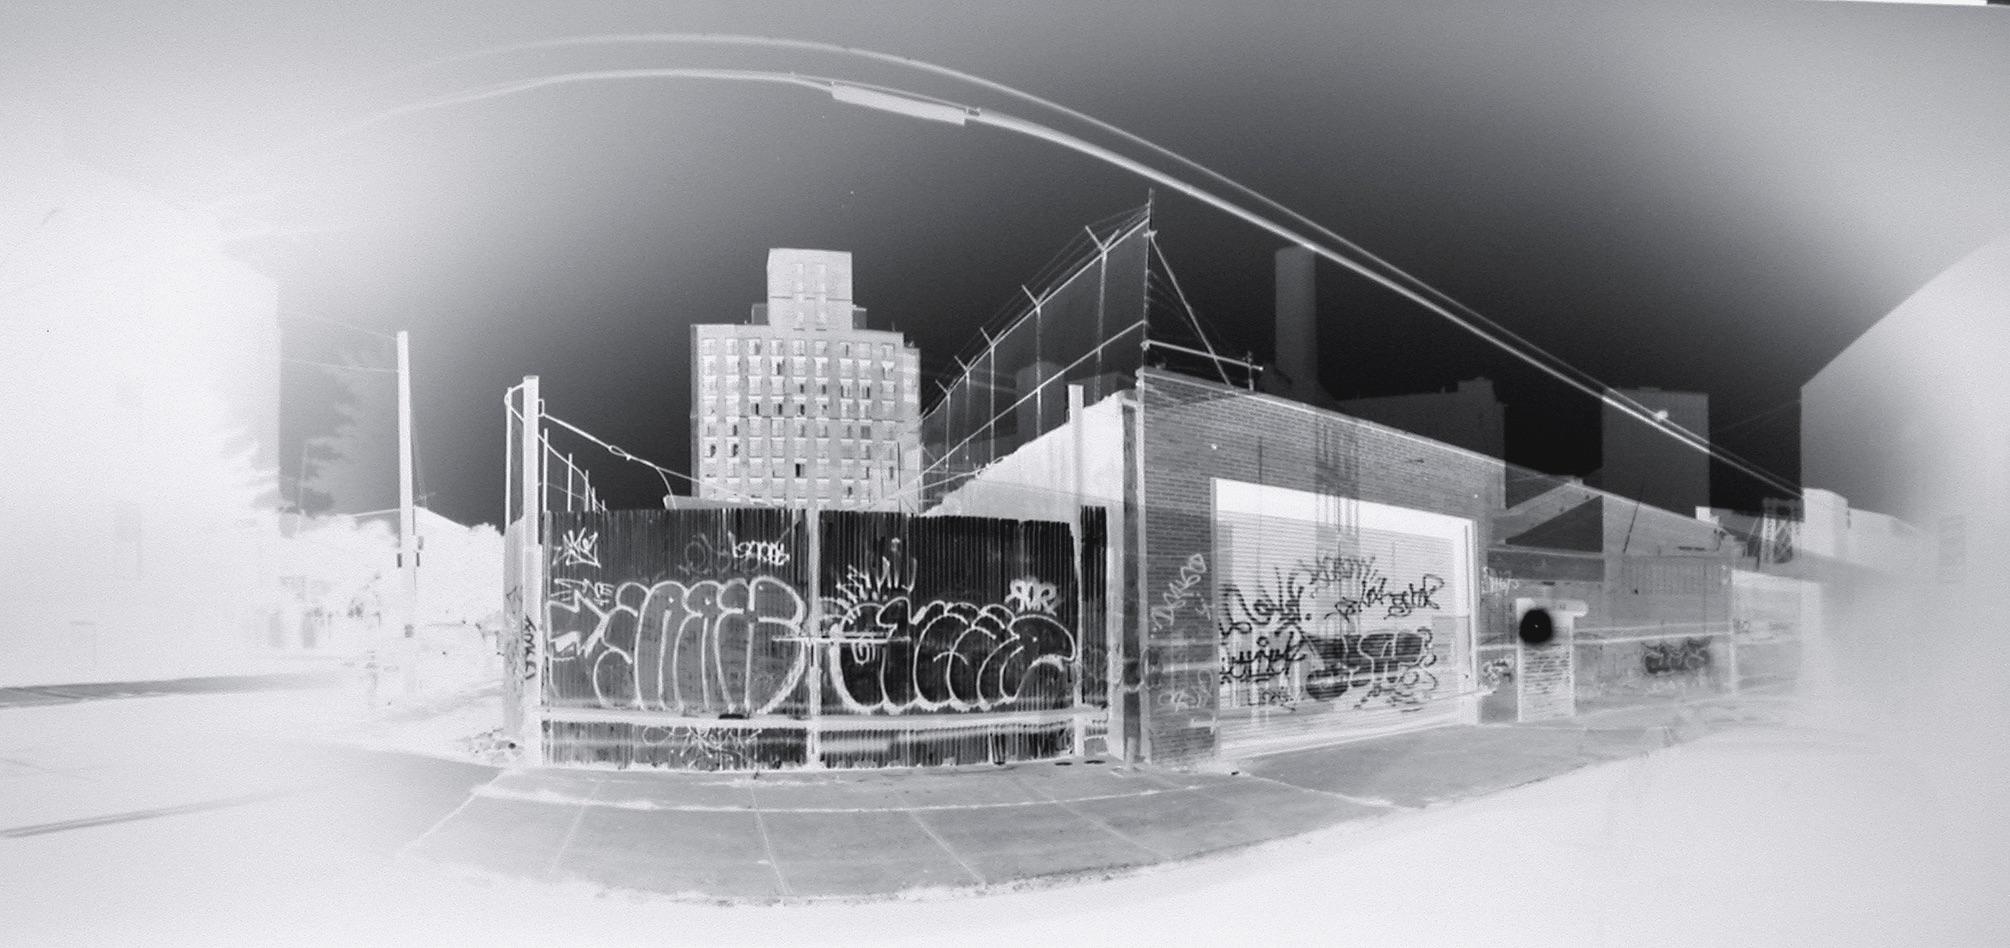 Graffiti Gate (2004)  Claire Lesteven  Courtoisie H Gallery, Paris